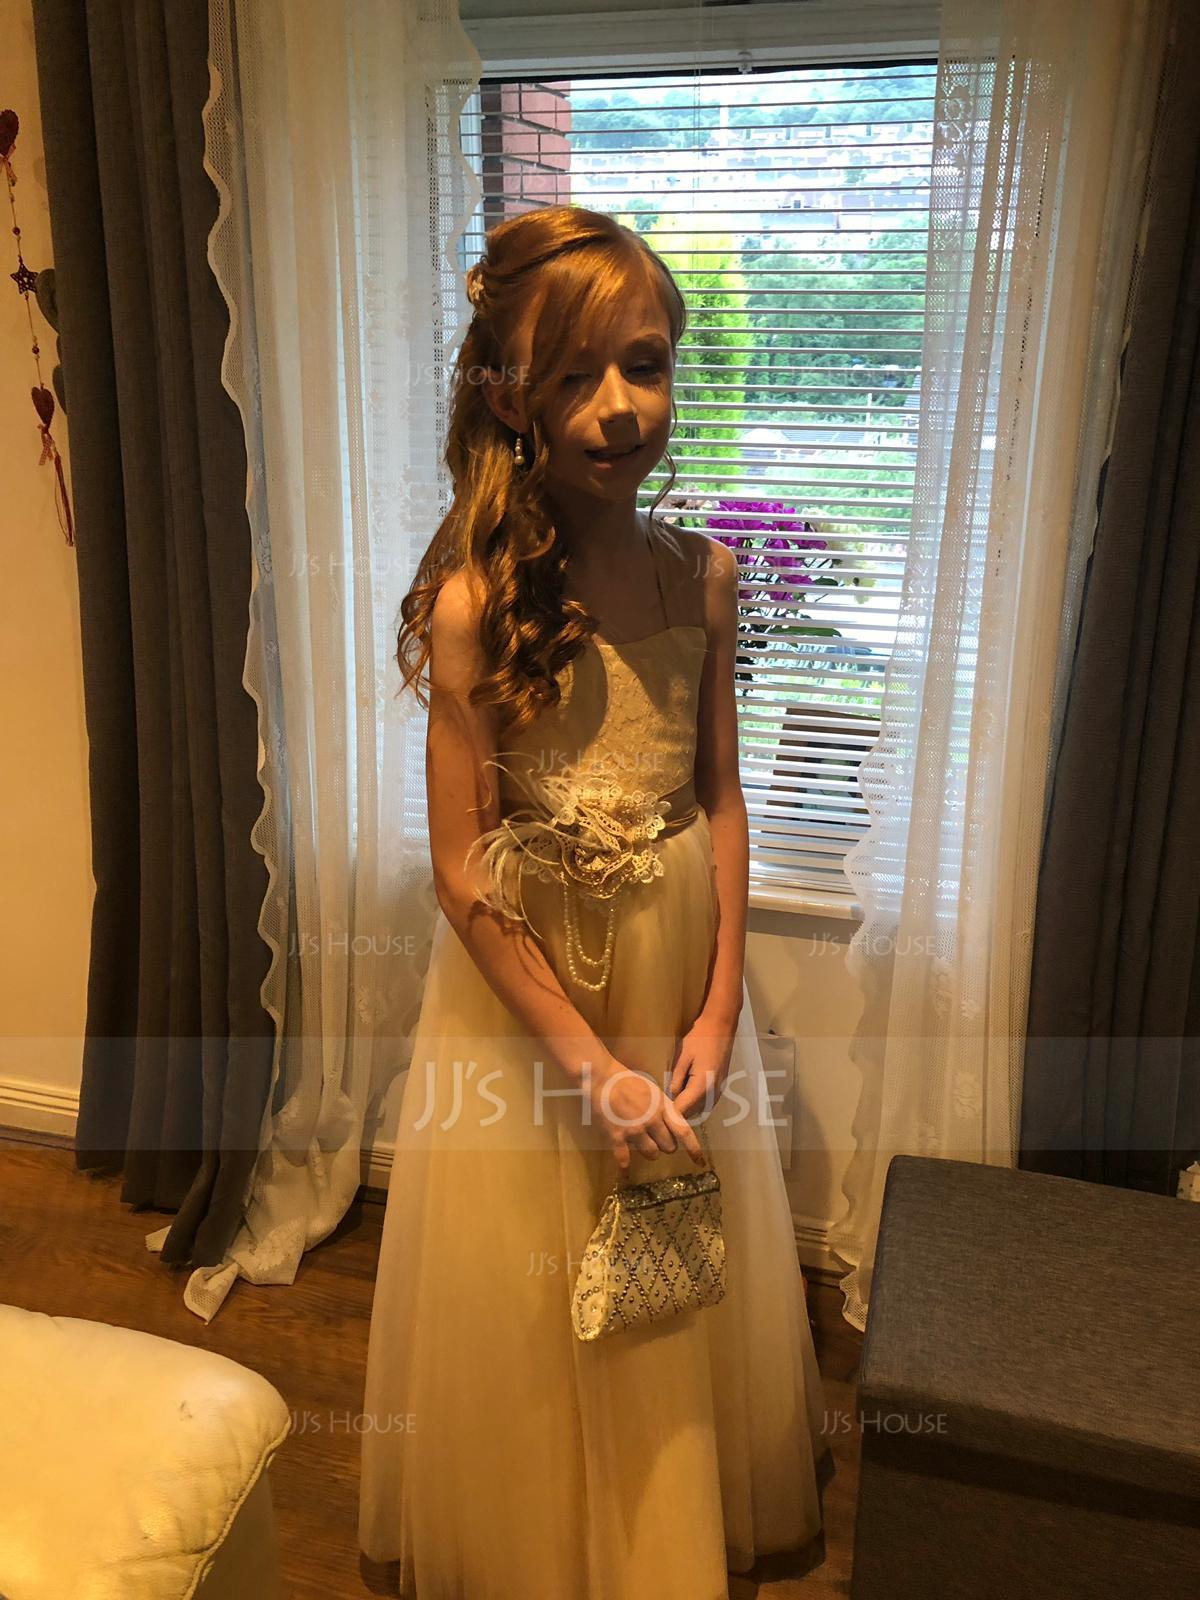 Ball Gown Floor-length Flower Girl Dress - Tulle/Lace Sleeveless Straps With Flower(s) (010091704)